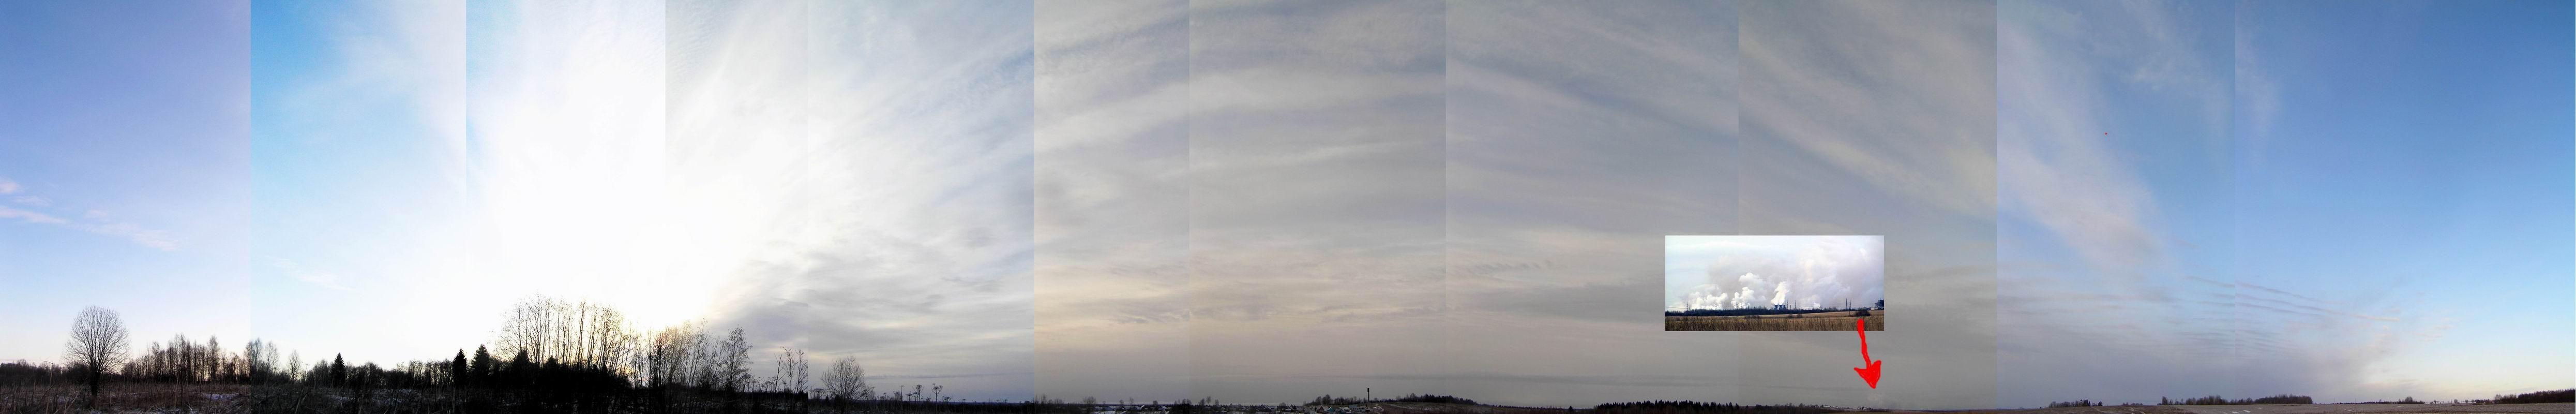 140404-Cherepovets-20km-Yaganovo-1